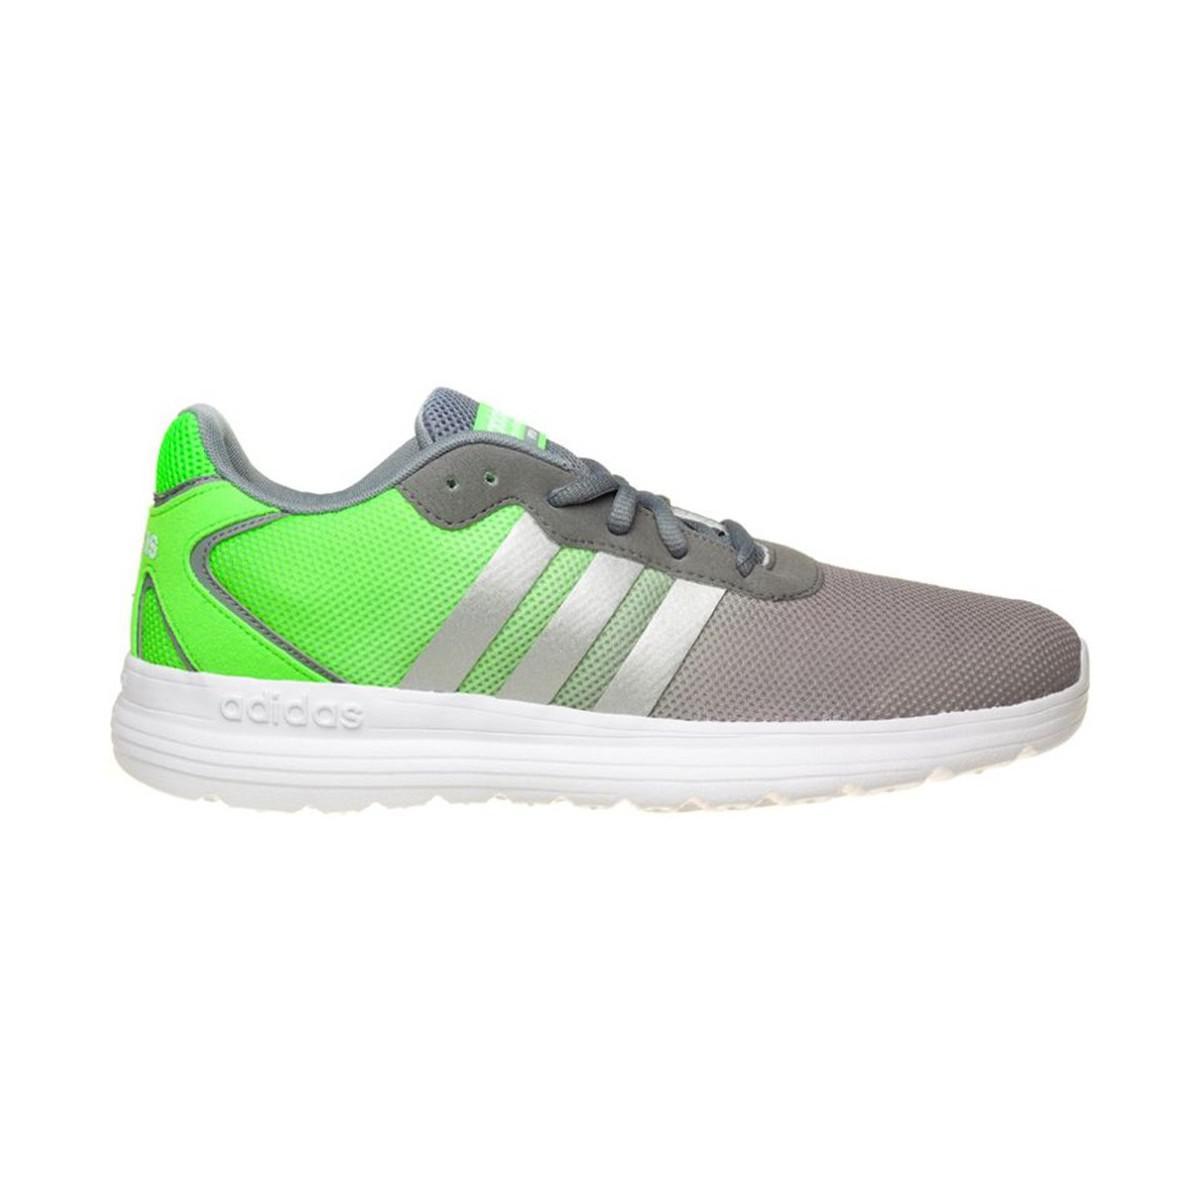 lyst adidas cloudfoam speed männer schuhe (ausbilder) in grün